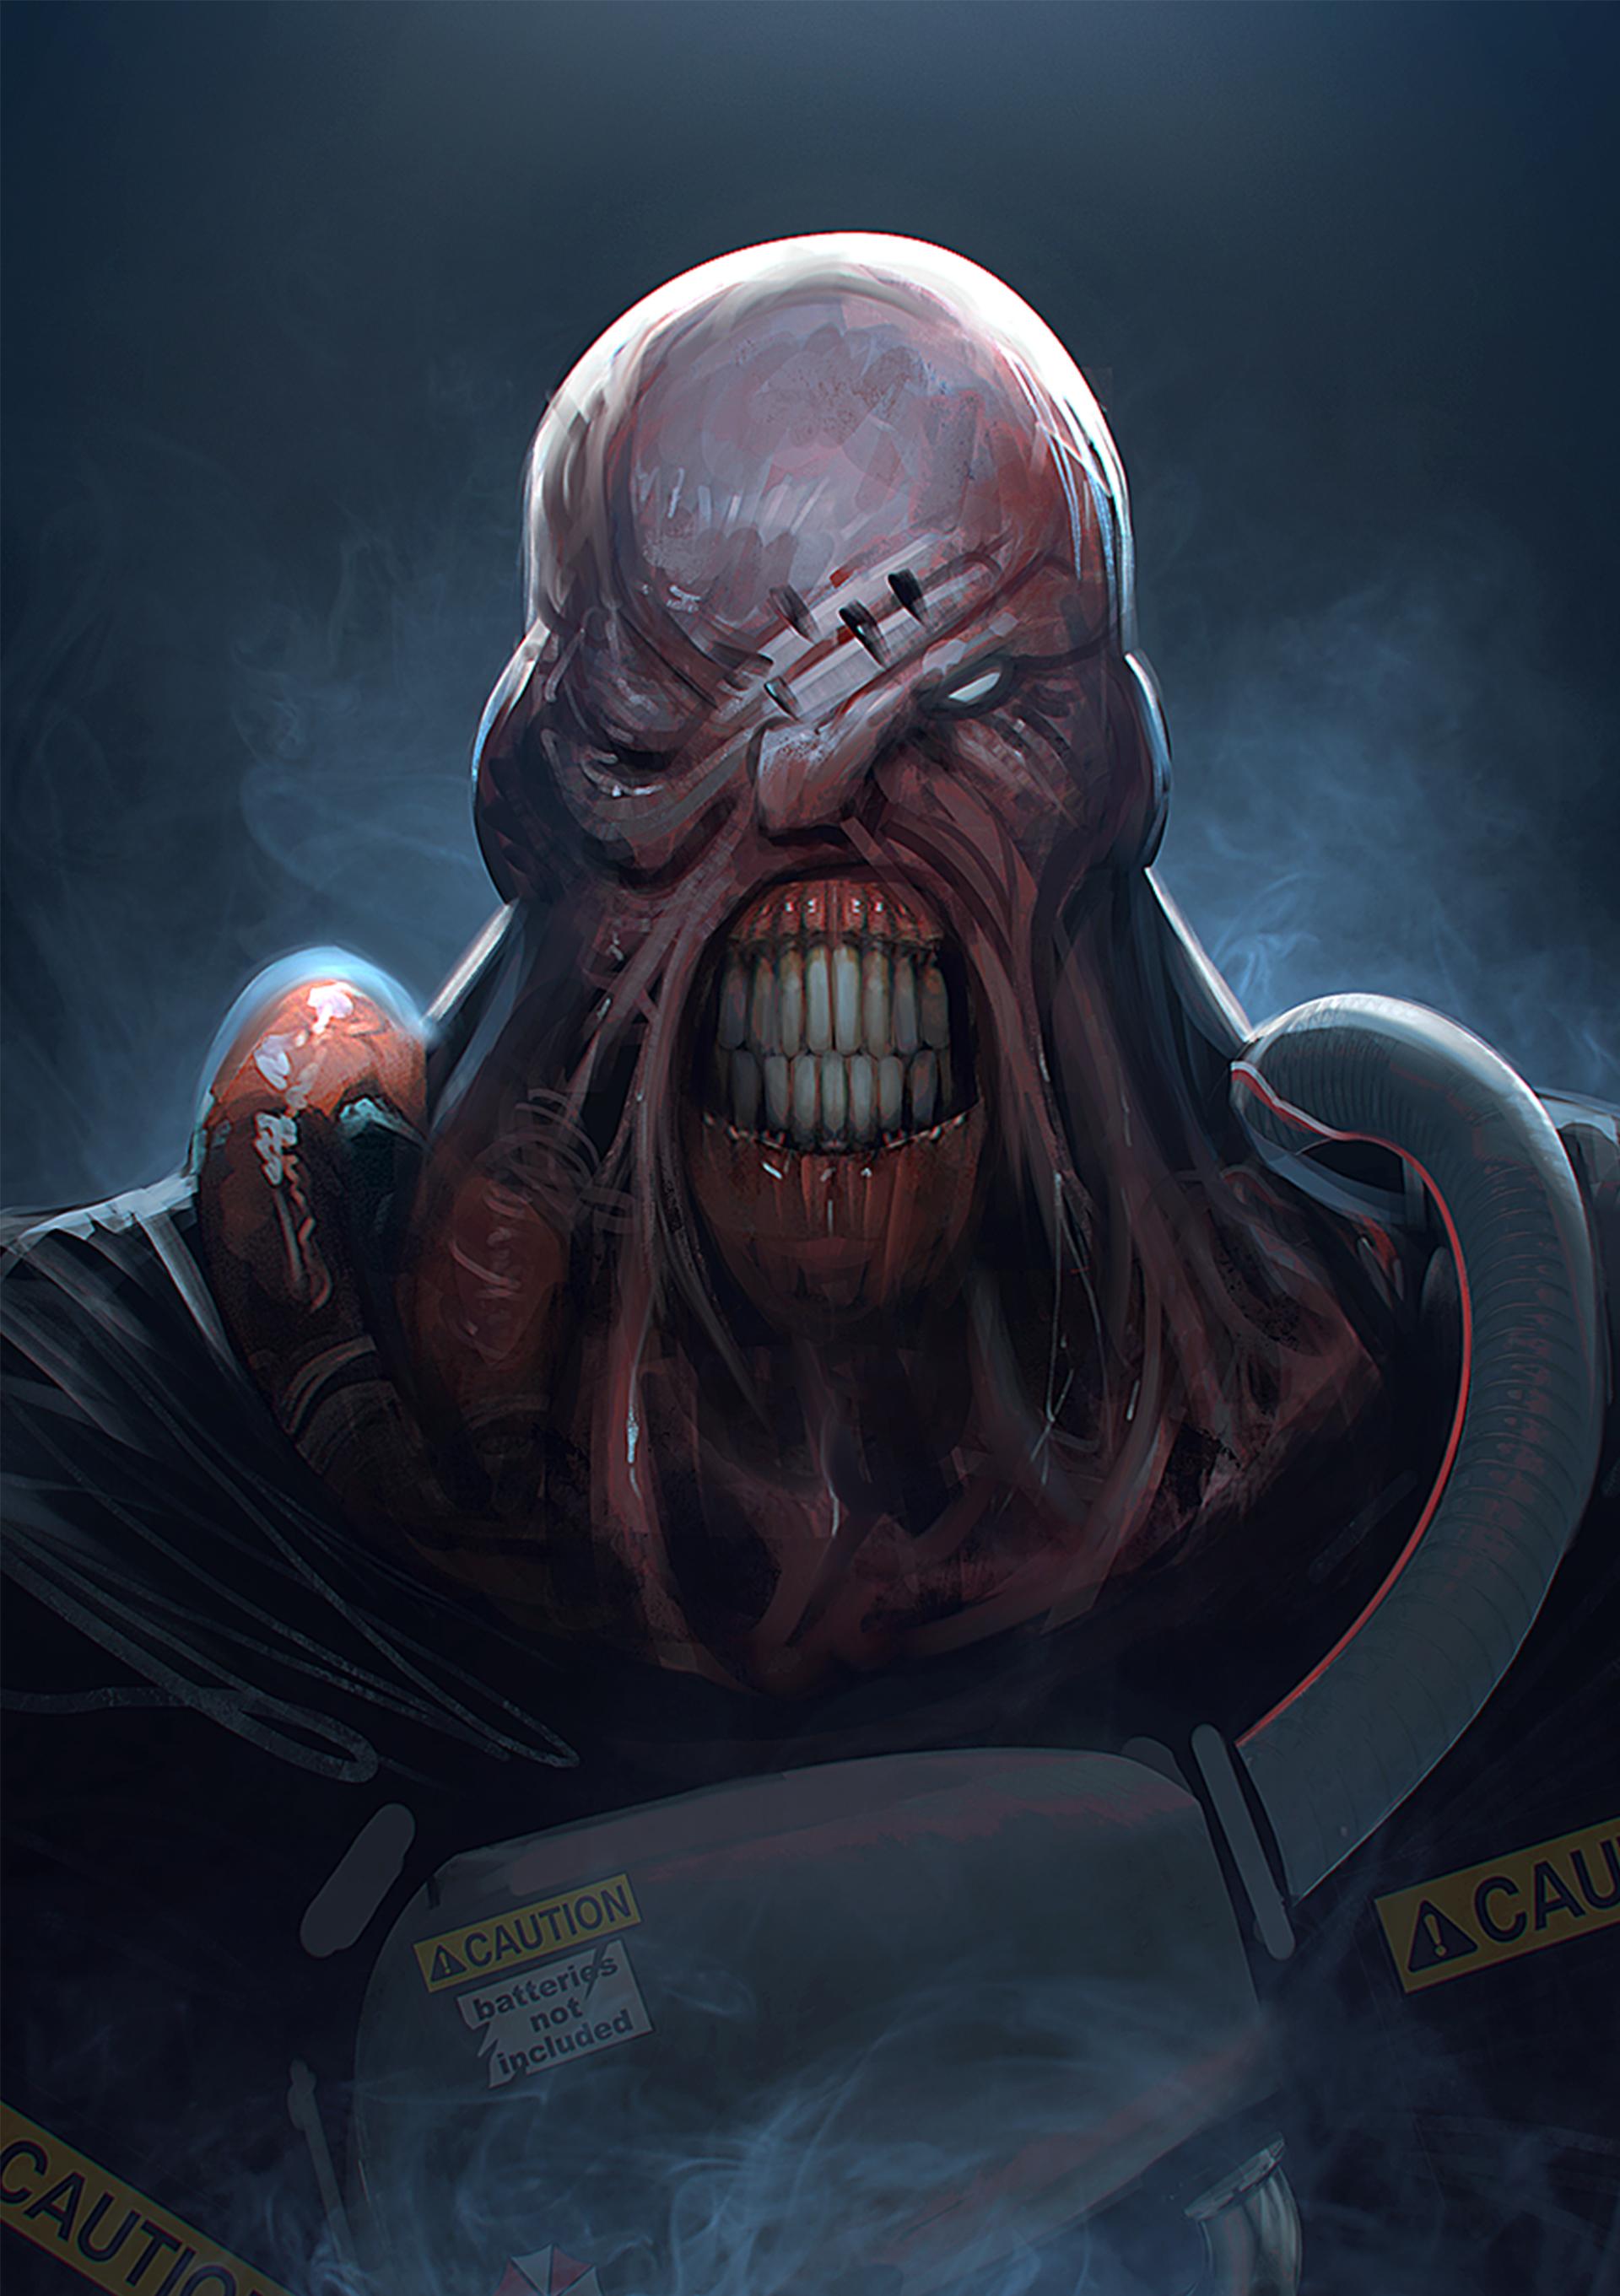 47 Resident Evil 3 Nemesis 2020 Wallpapers On Wallpapersafari